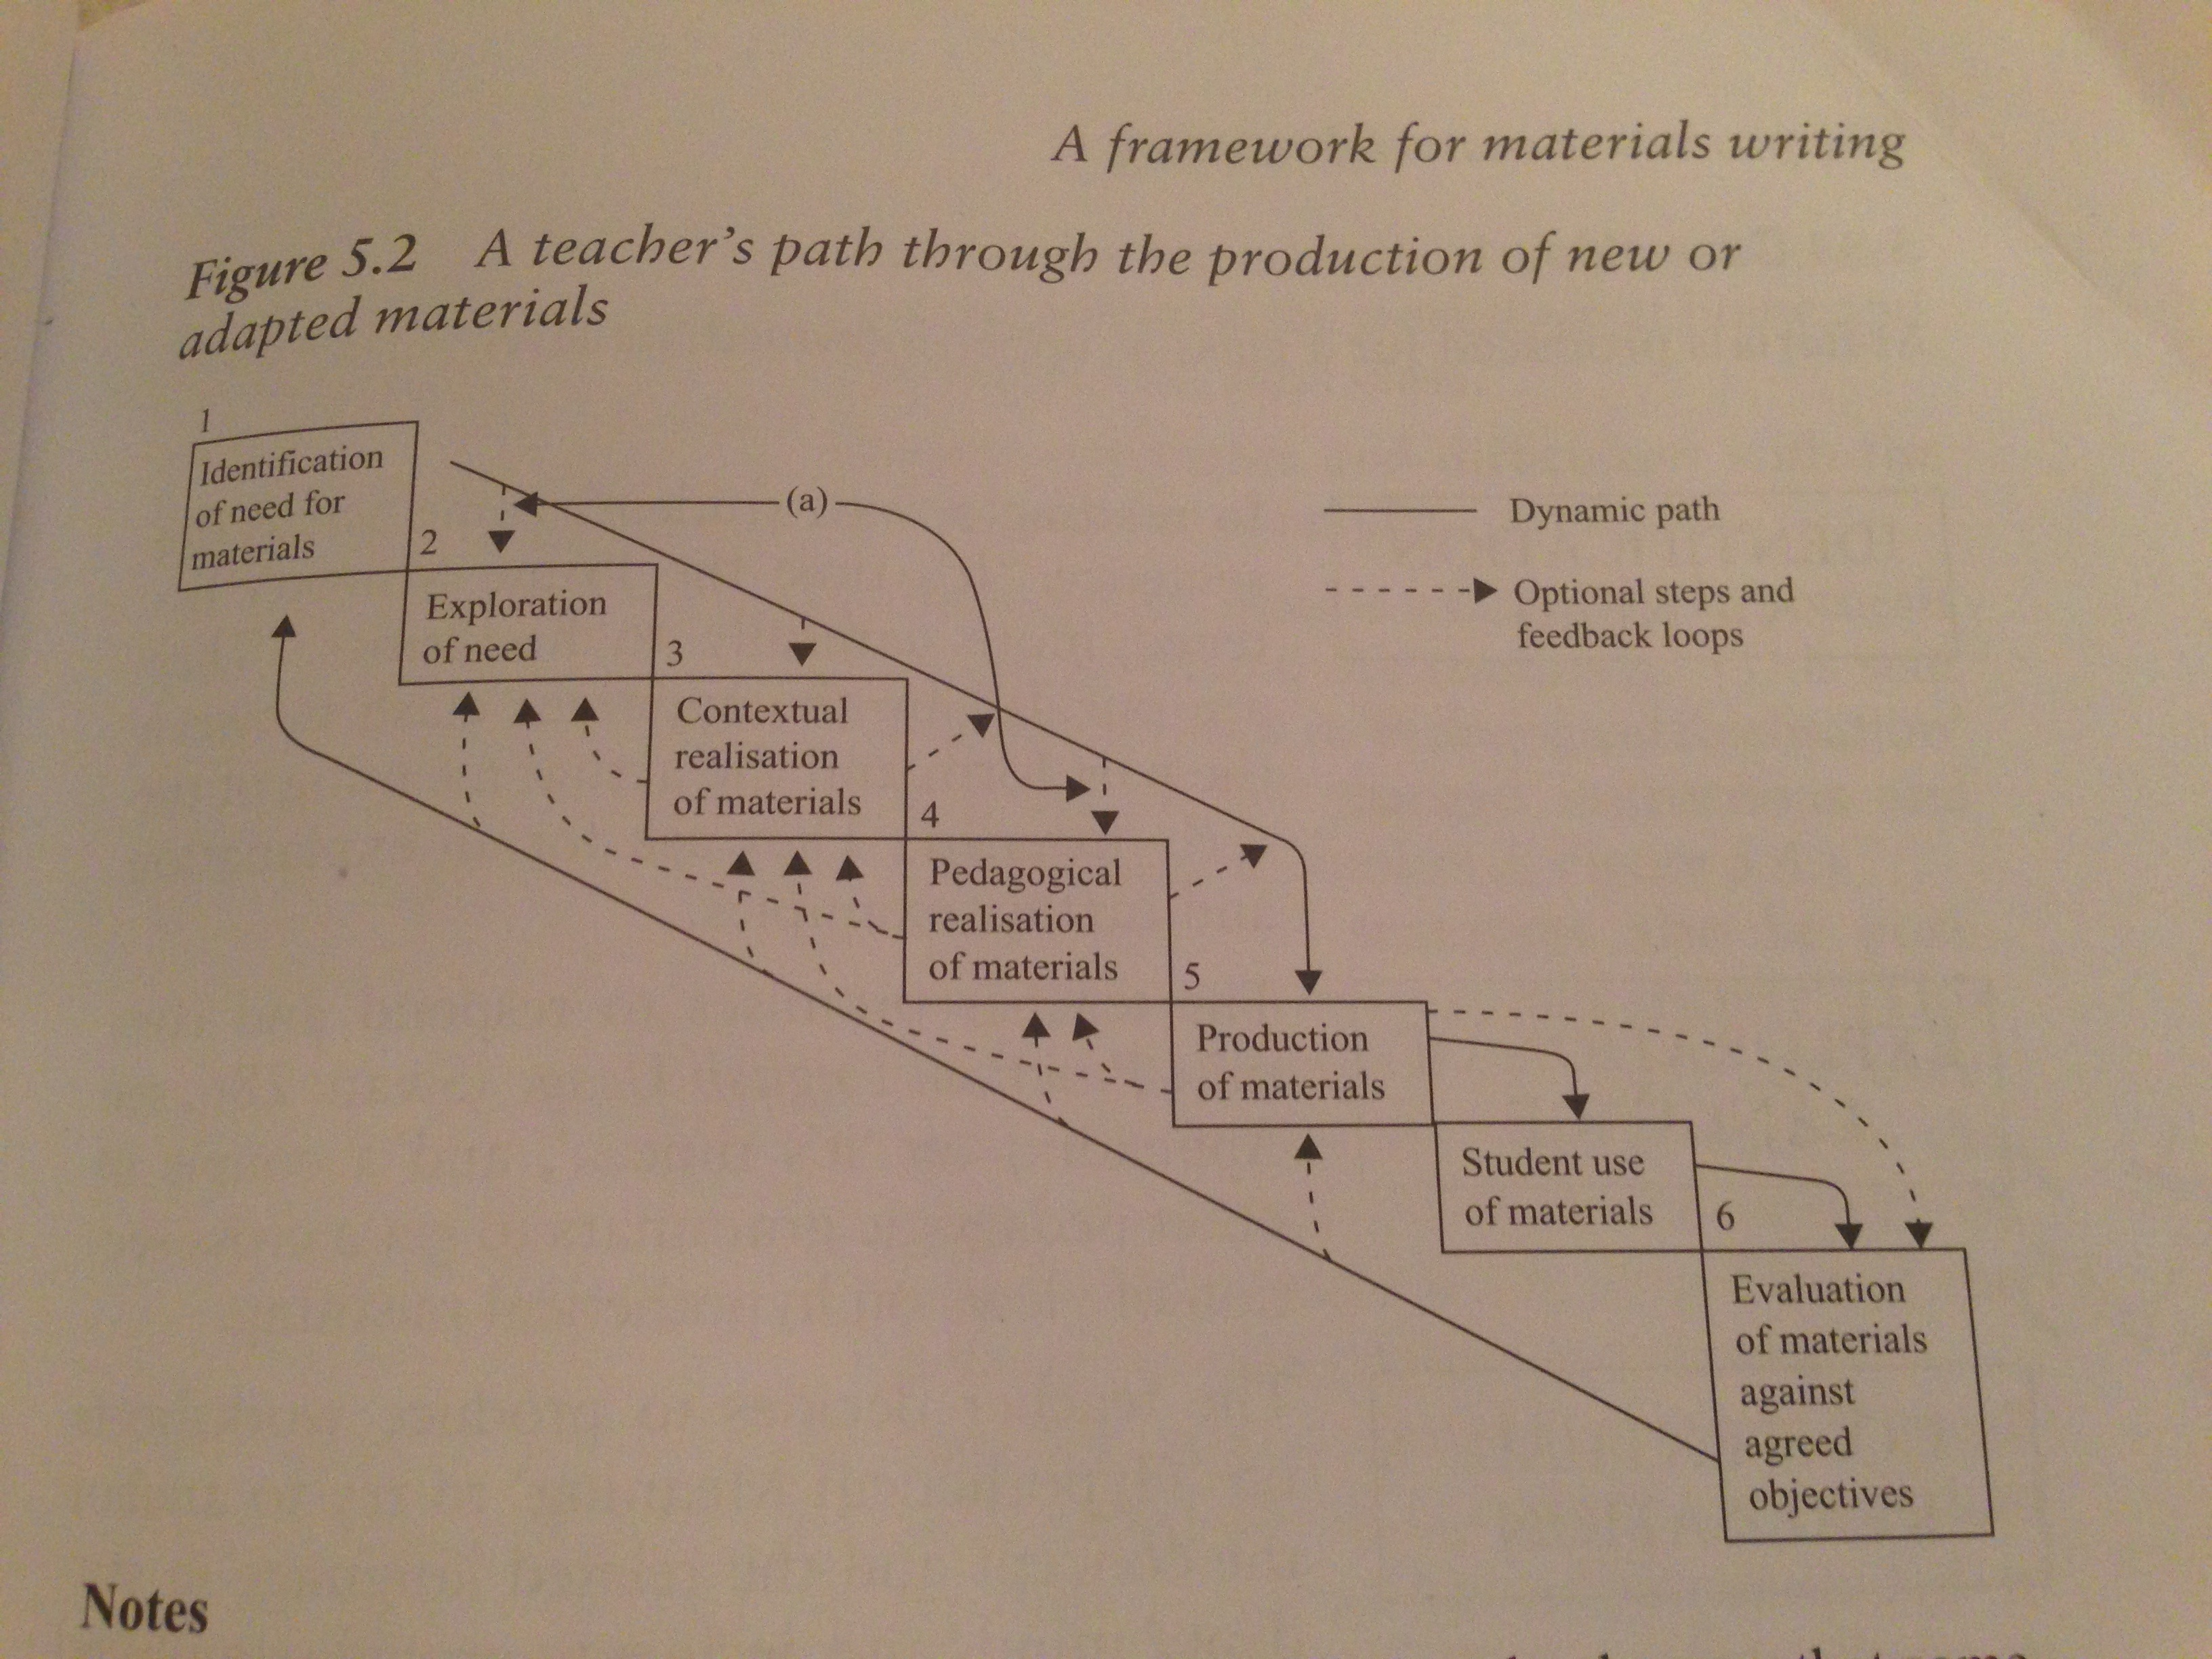 a framework for materials writing efl materials. Black Bedroom Furniture Sets. Home Design Ideas